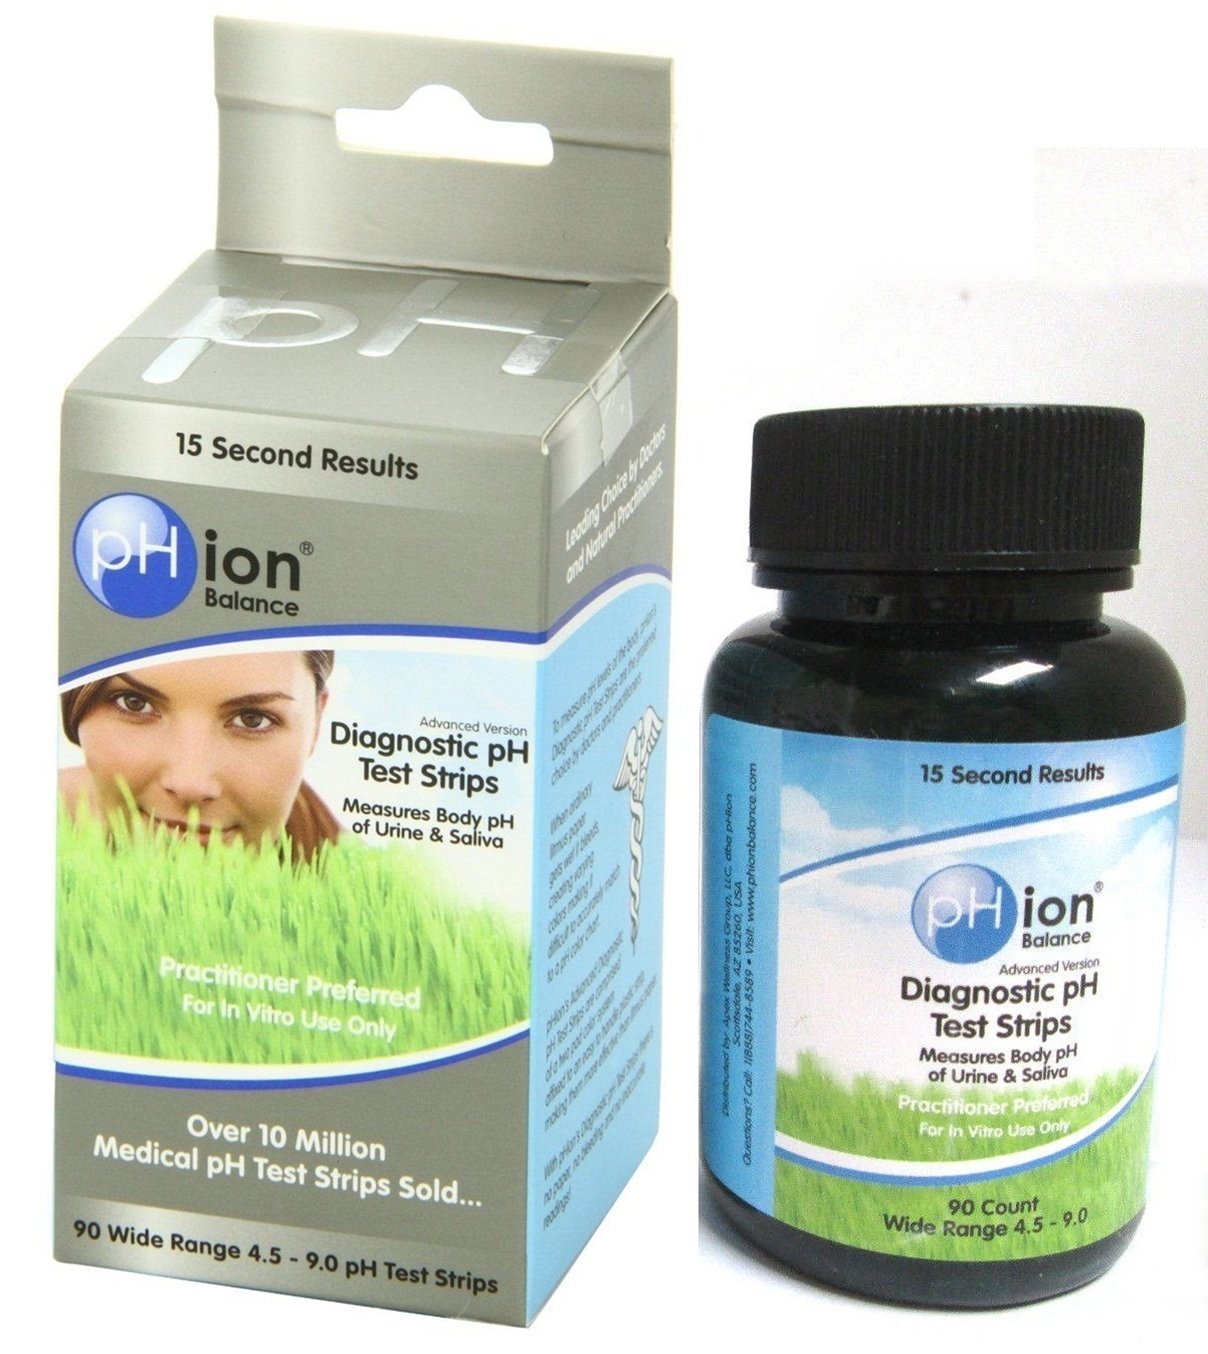 90-Count Glittering Modern pH Balance Test Strips Diagnostic Kit Urine and Saliva Sensitive Check 4.5-9.0 Wide Range